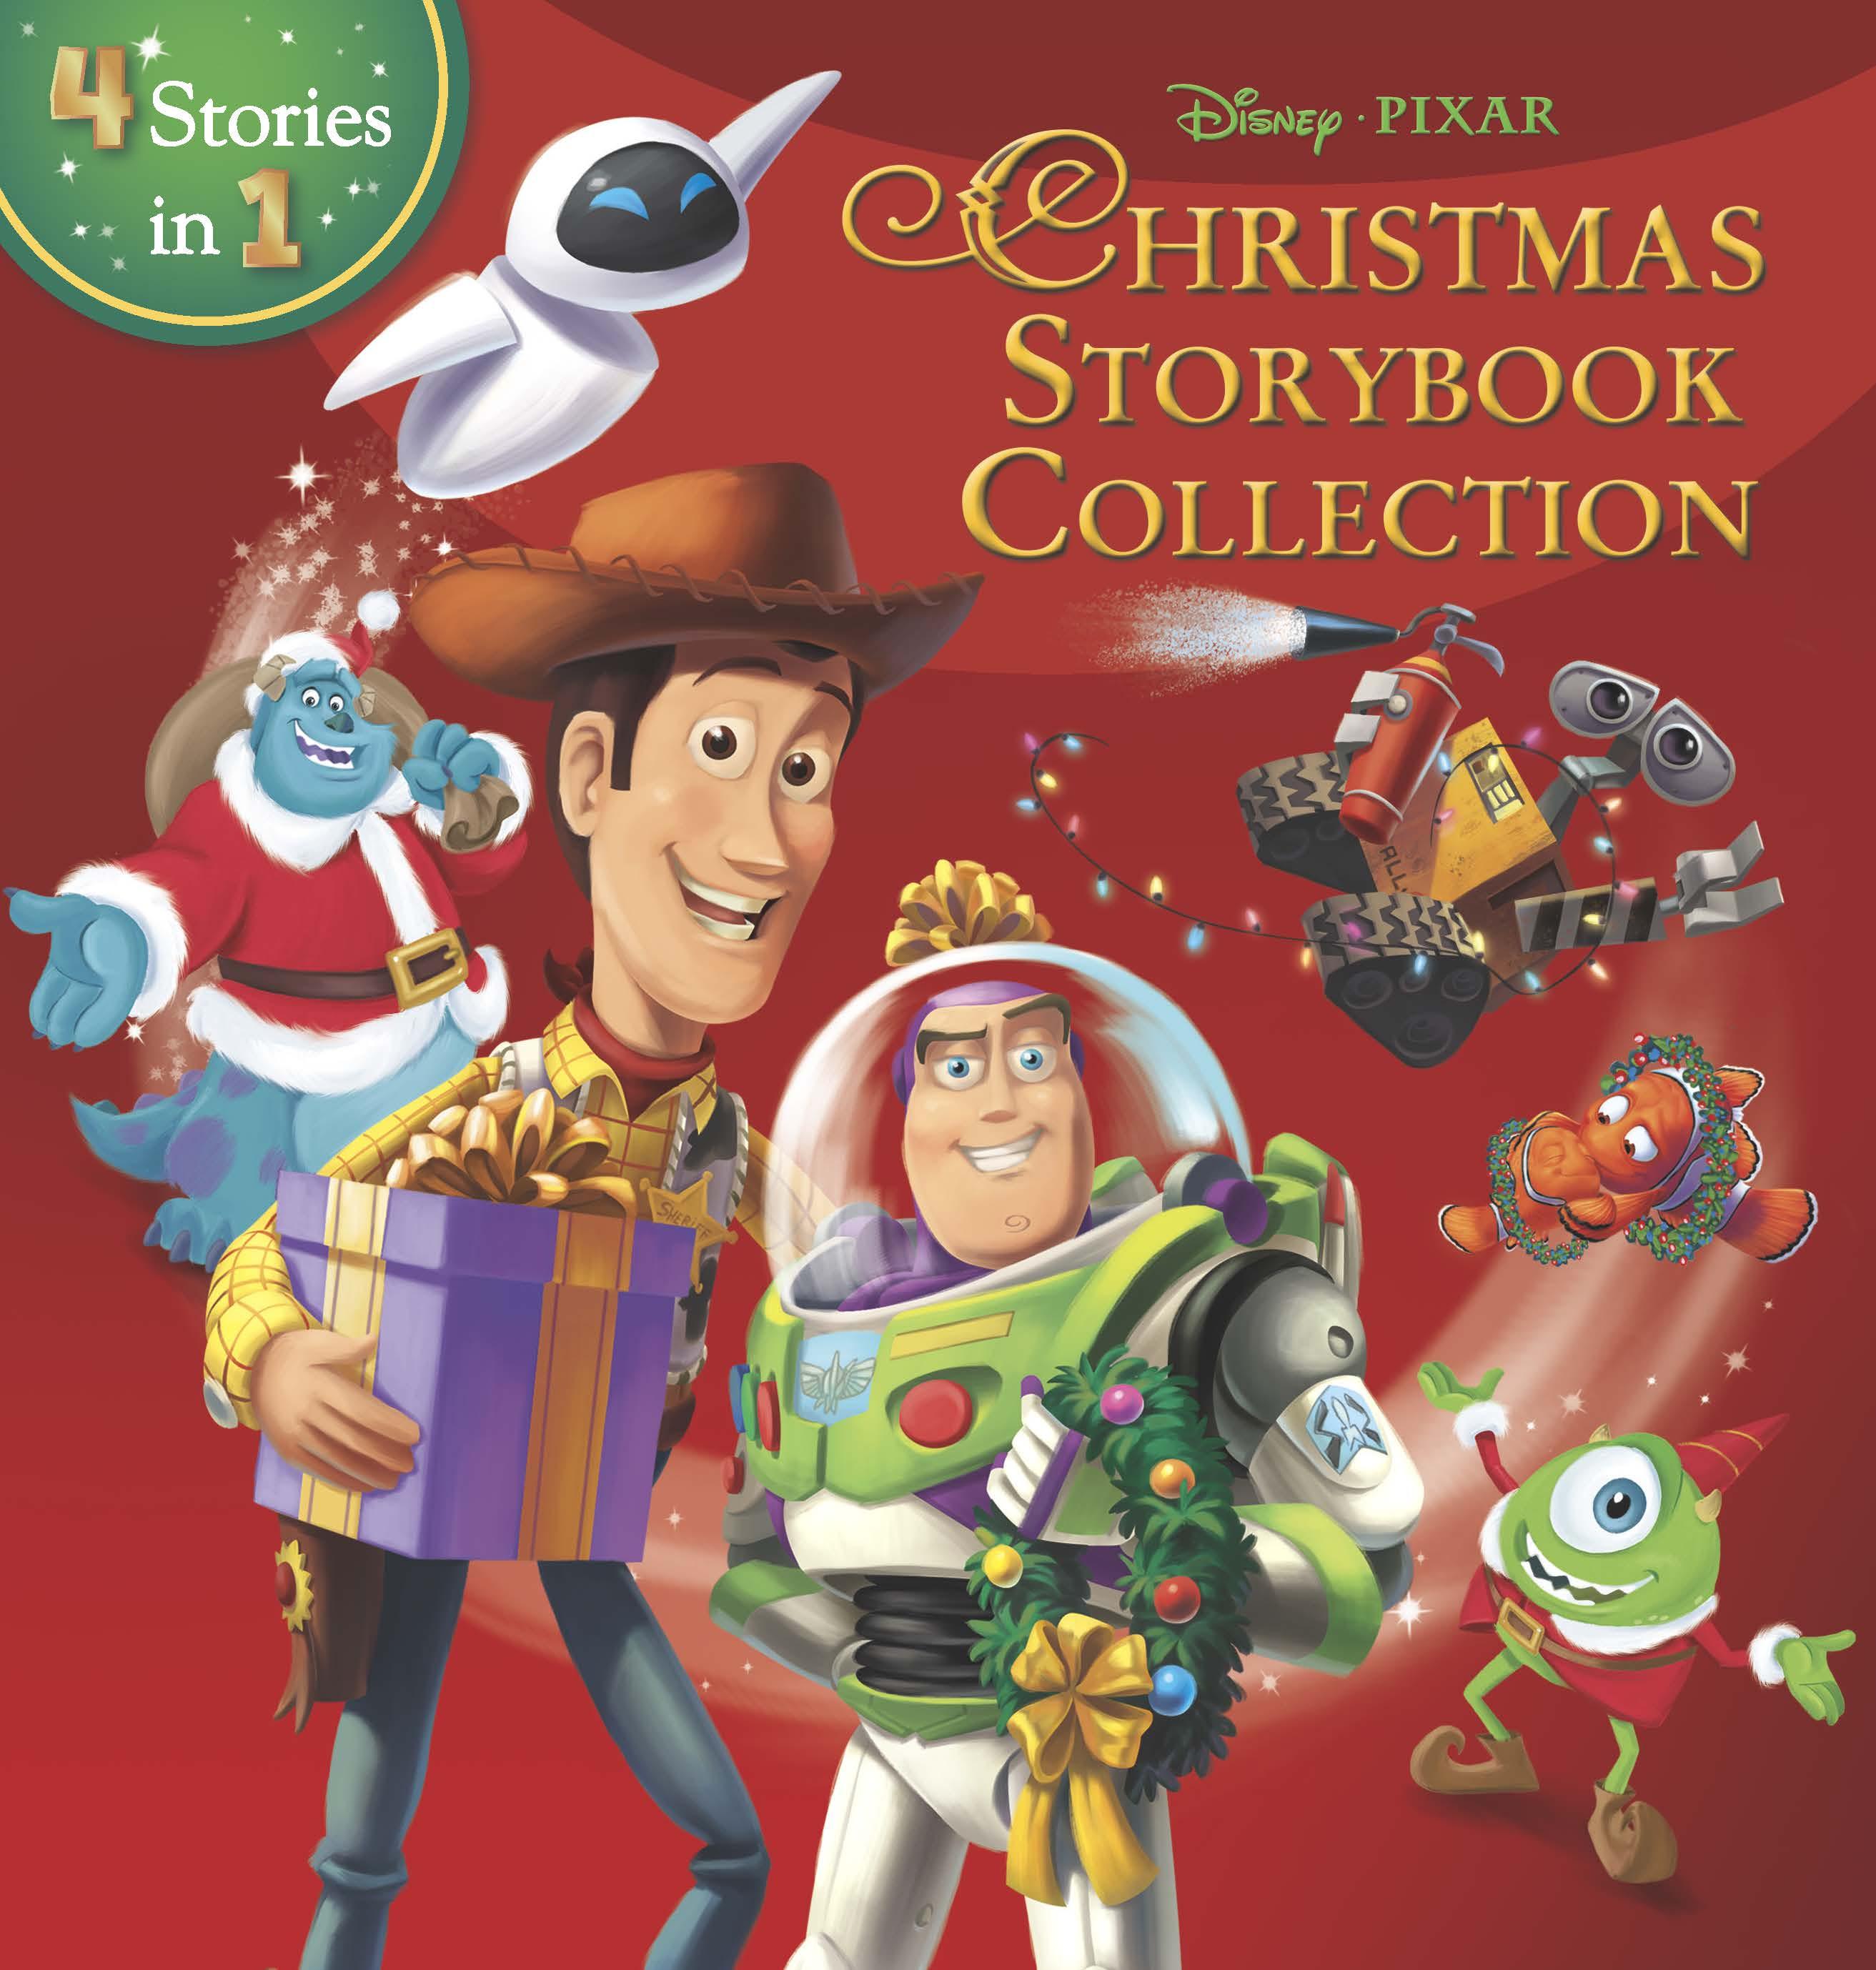 disneypixar christmas storybook collection - Disney Christmas Storybook Collection